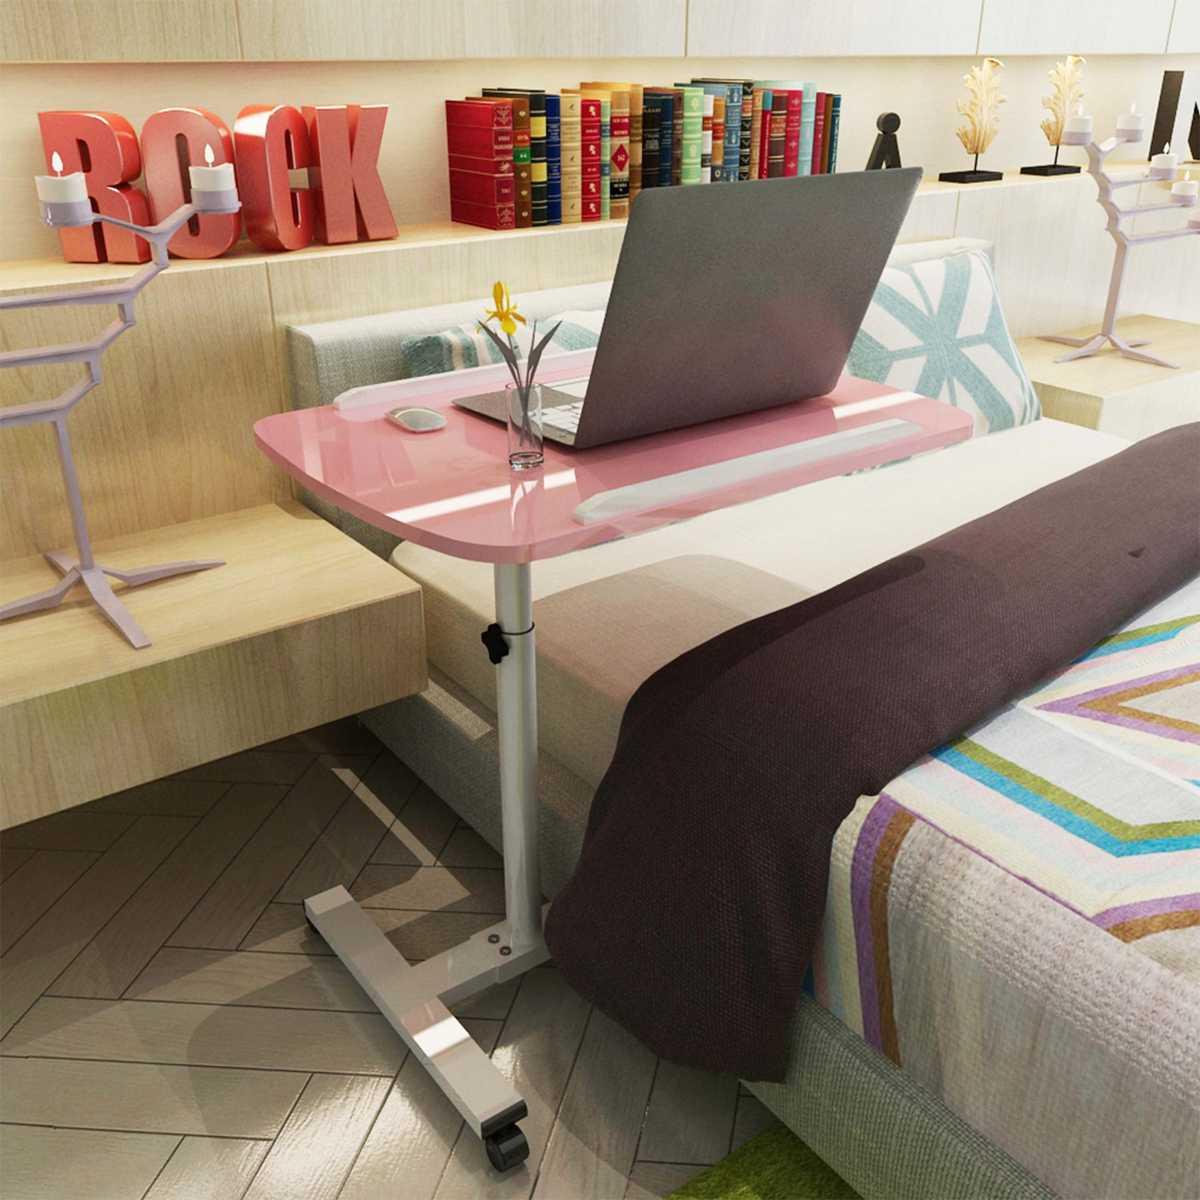 Foldable Removable Laptop Table Bed Desk Notebook Stand Table Bedside Sofa Bed Adjustable Portable Computer ble Bedside Sofa Bed